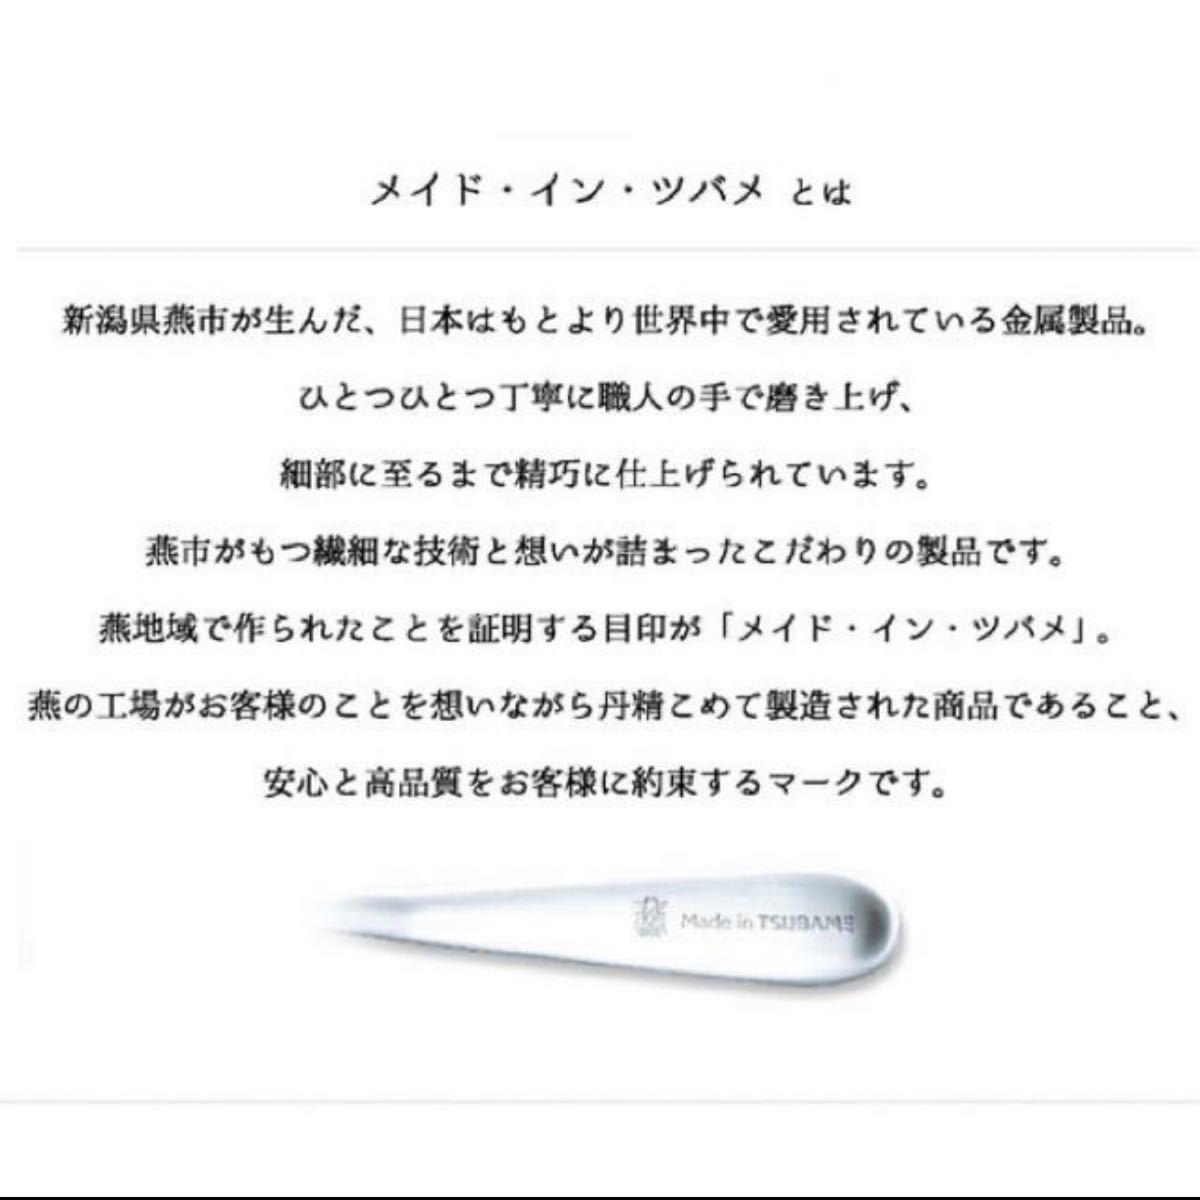 made in TSUBAME ピーラー 燕三条 ステンレス